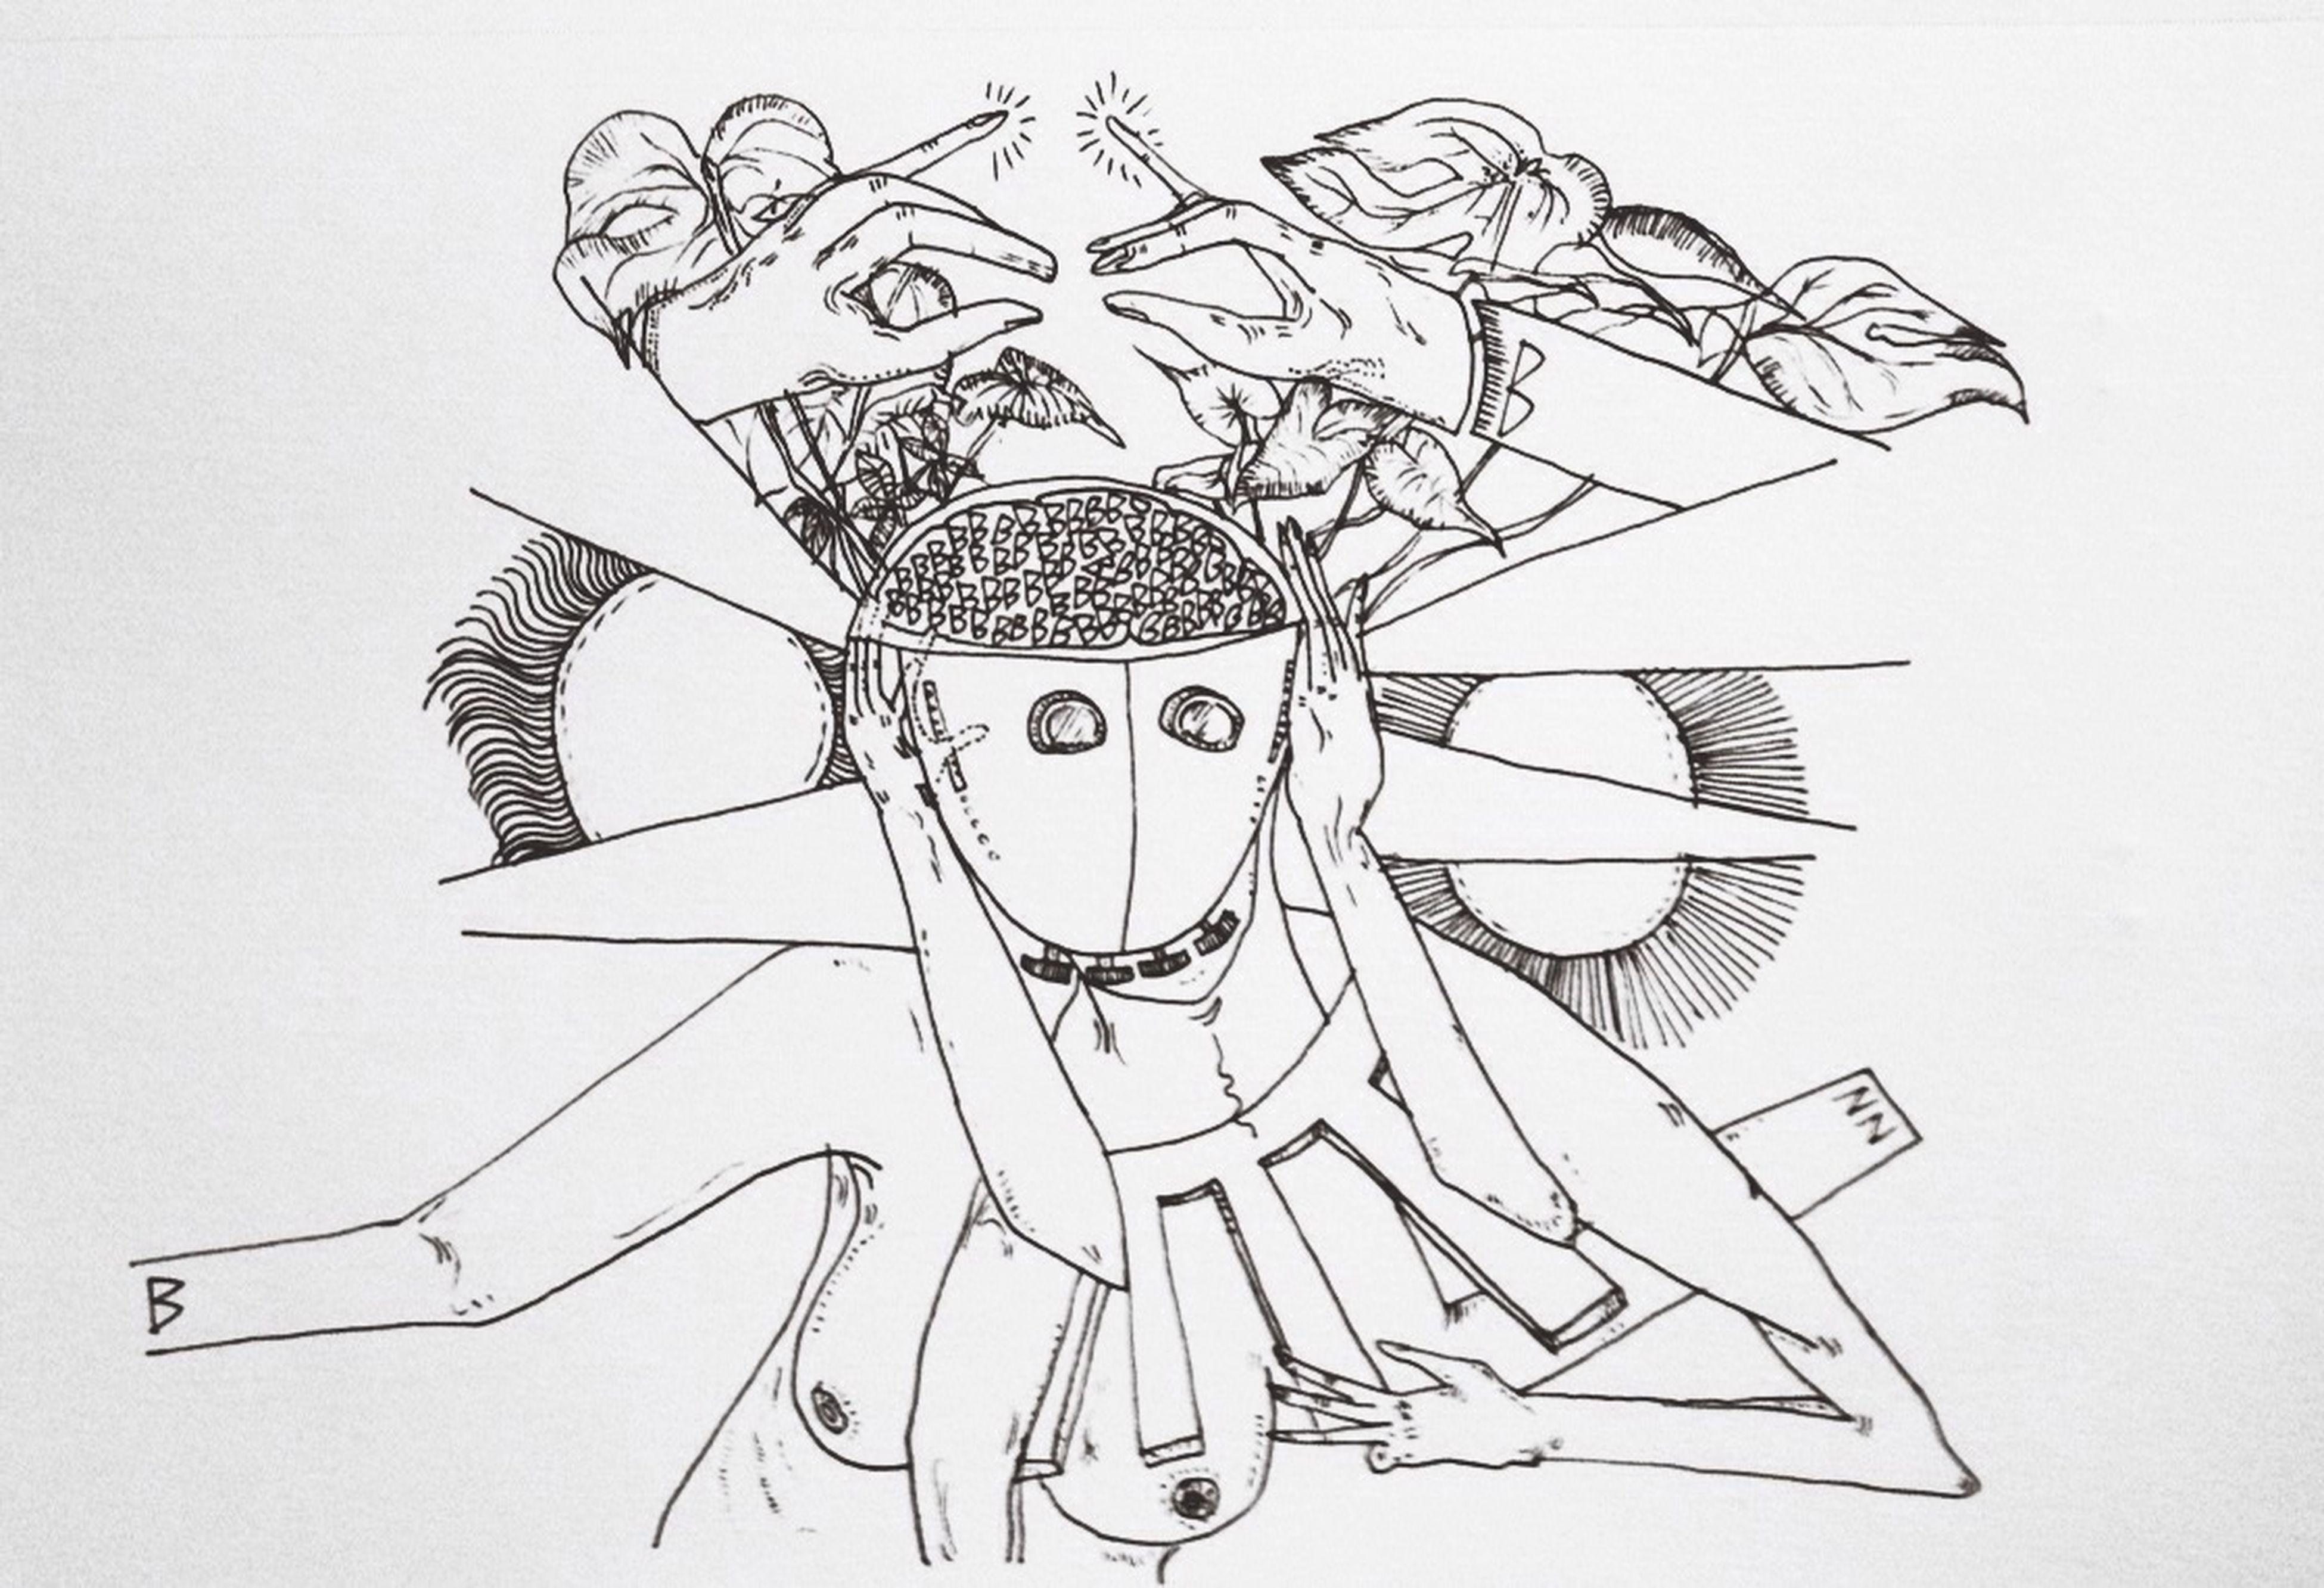 art and craft, art, creativity, studio shot, white background, still life, close-up, indoors, paper, ideas, text, communication, western script, craft, no people, decoration, animal representation, design, pattern, metal